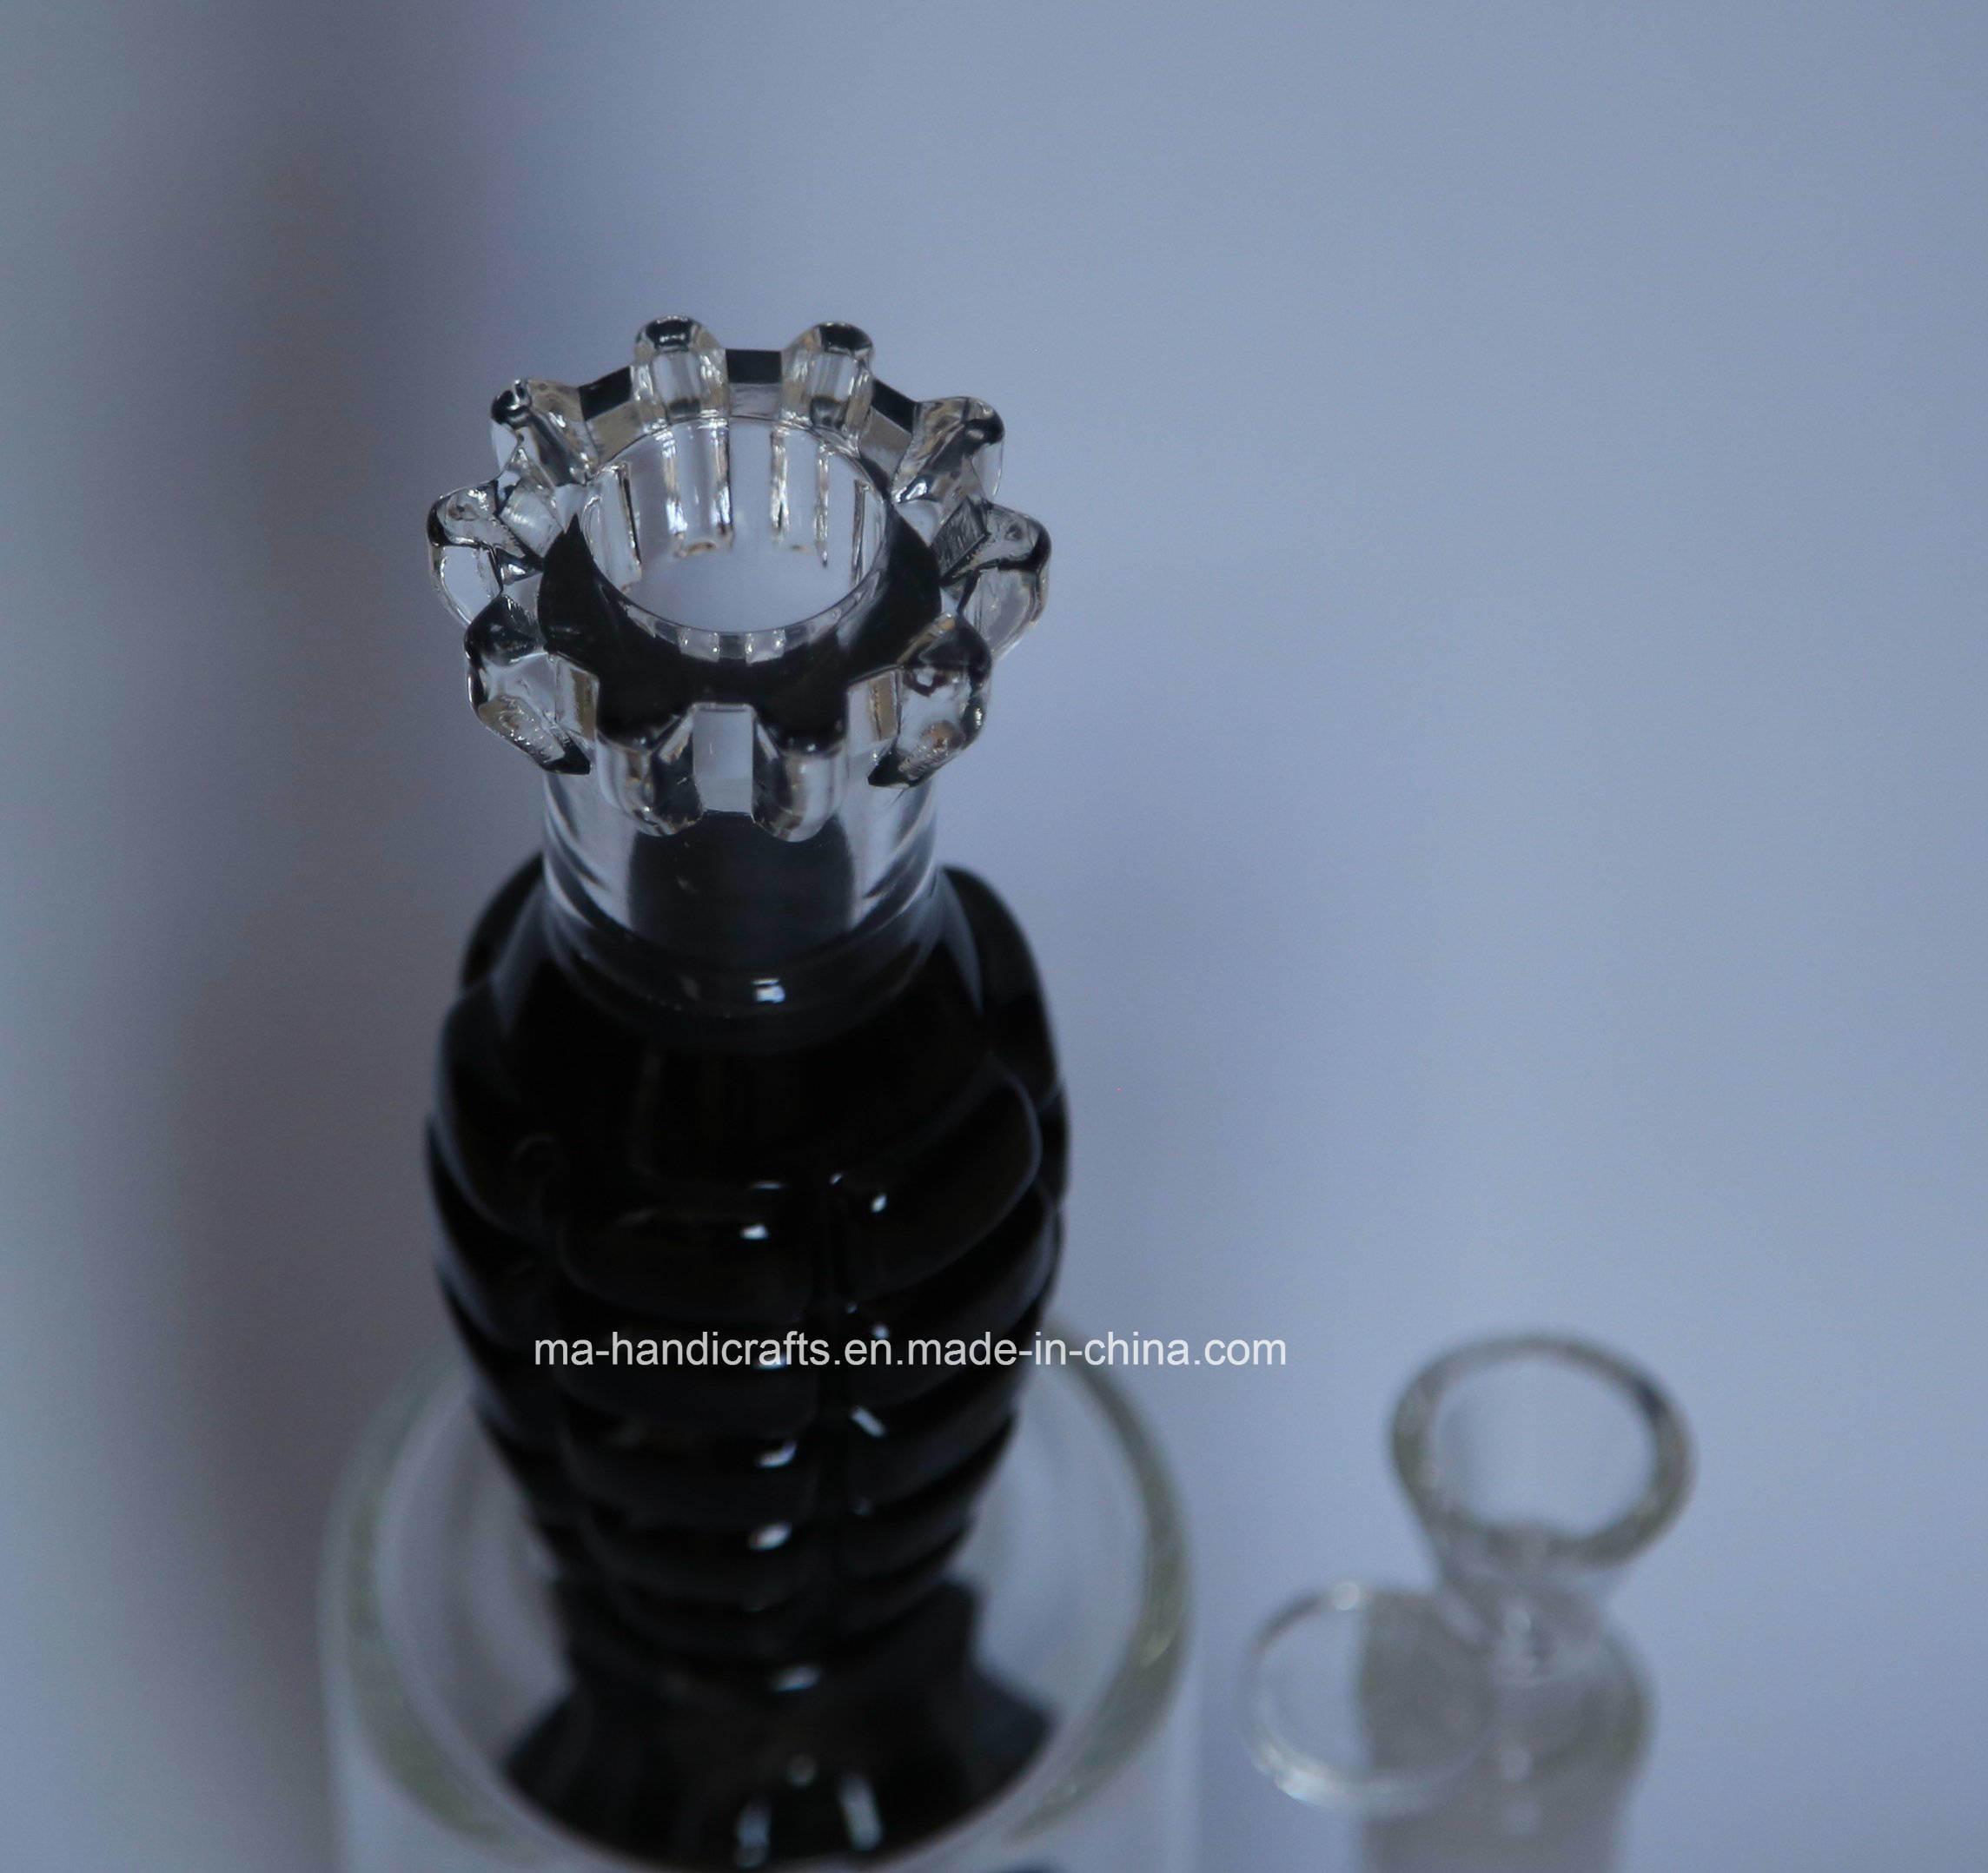 Grenade Glass Water Pipes/Tobacco Smoking Pipes Hookah